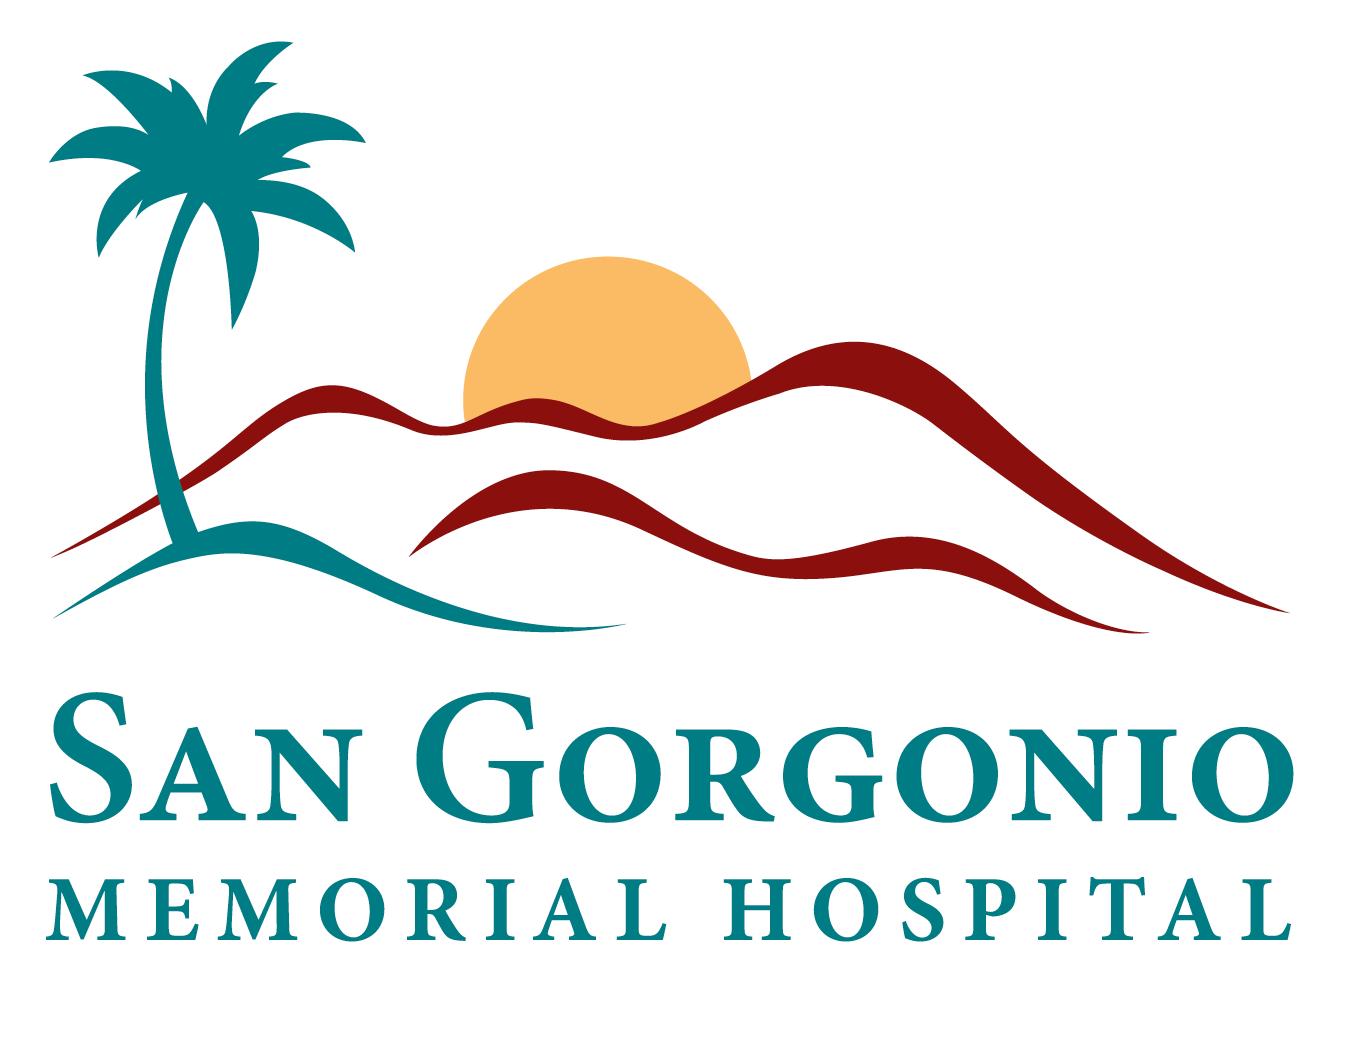 San Gorgonio Memorial Hospital logo